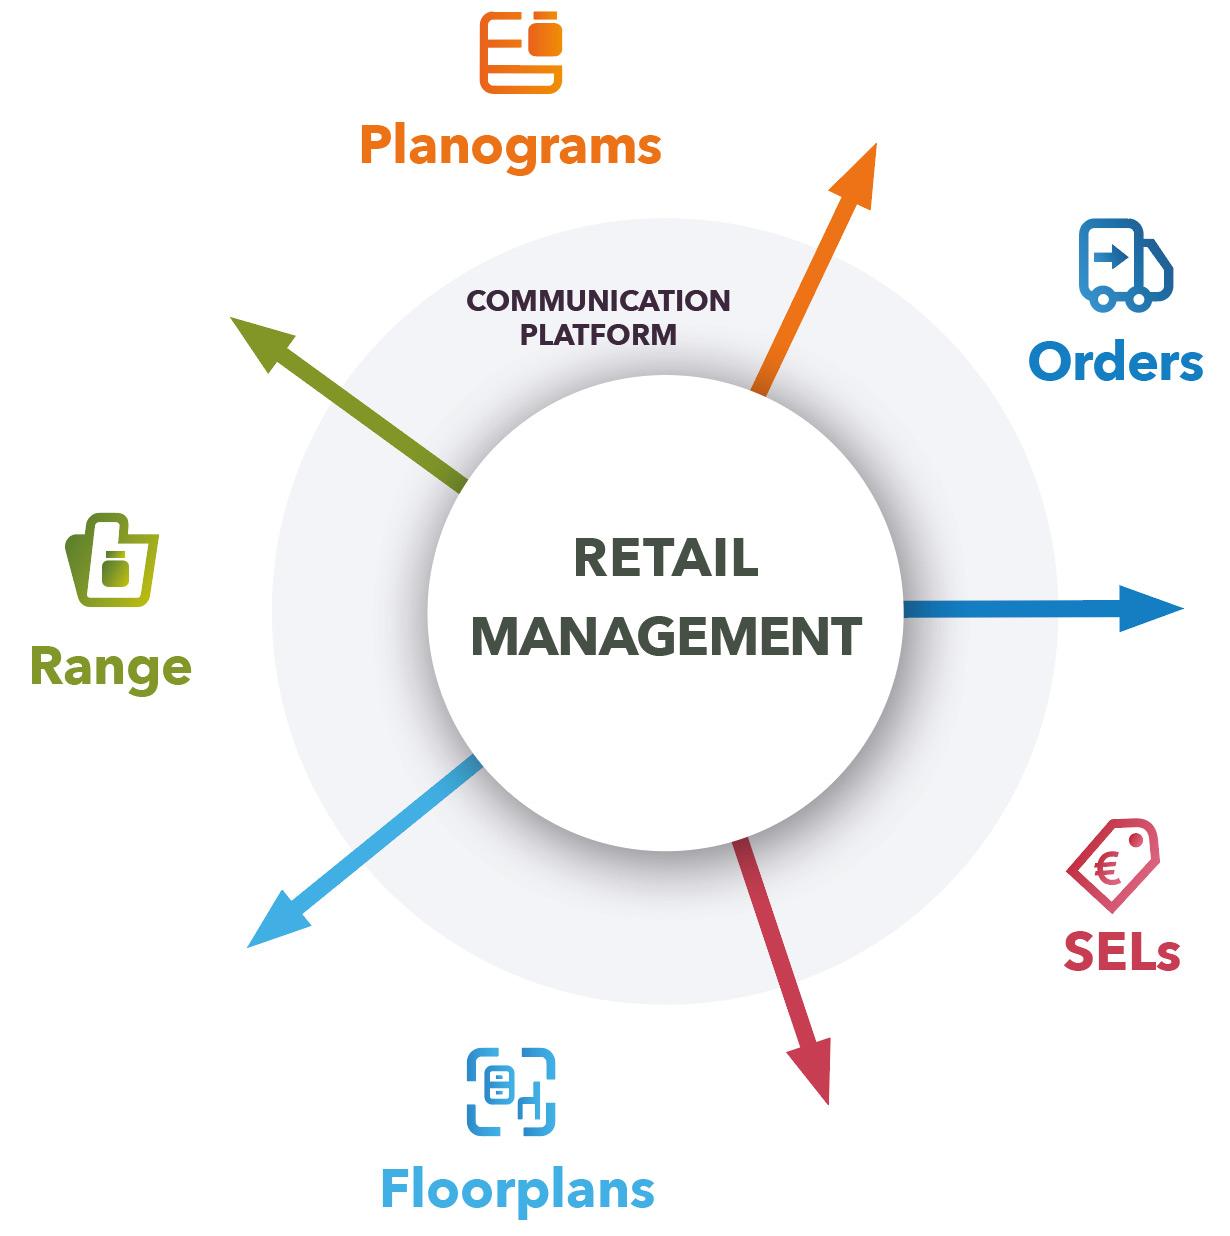 retail-management-image